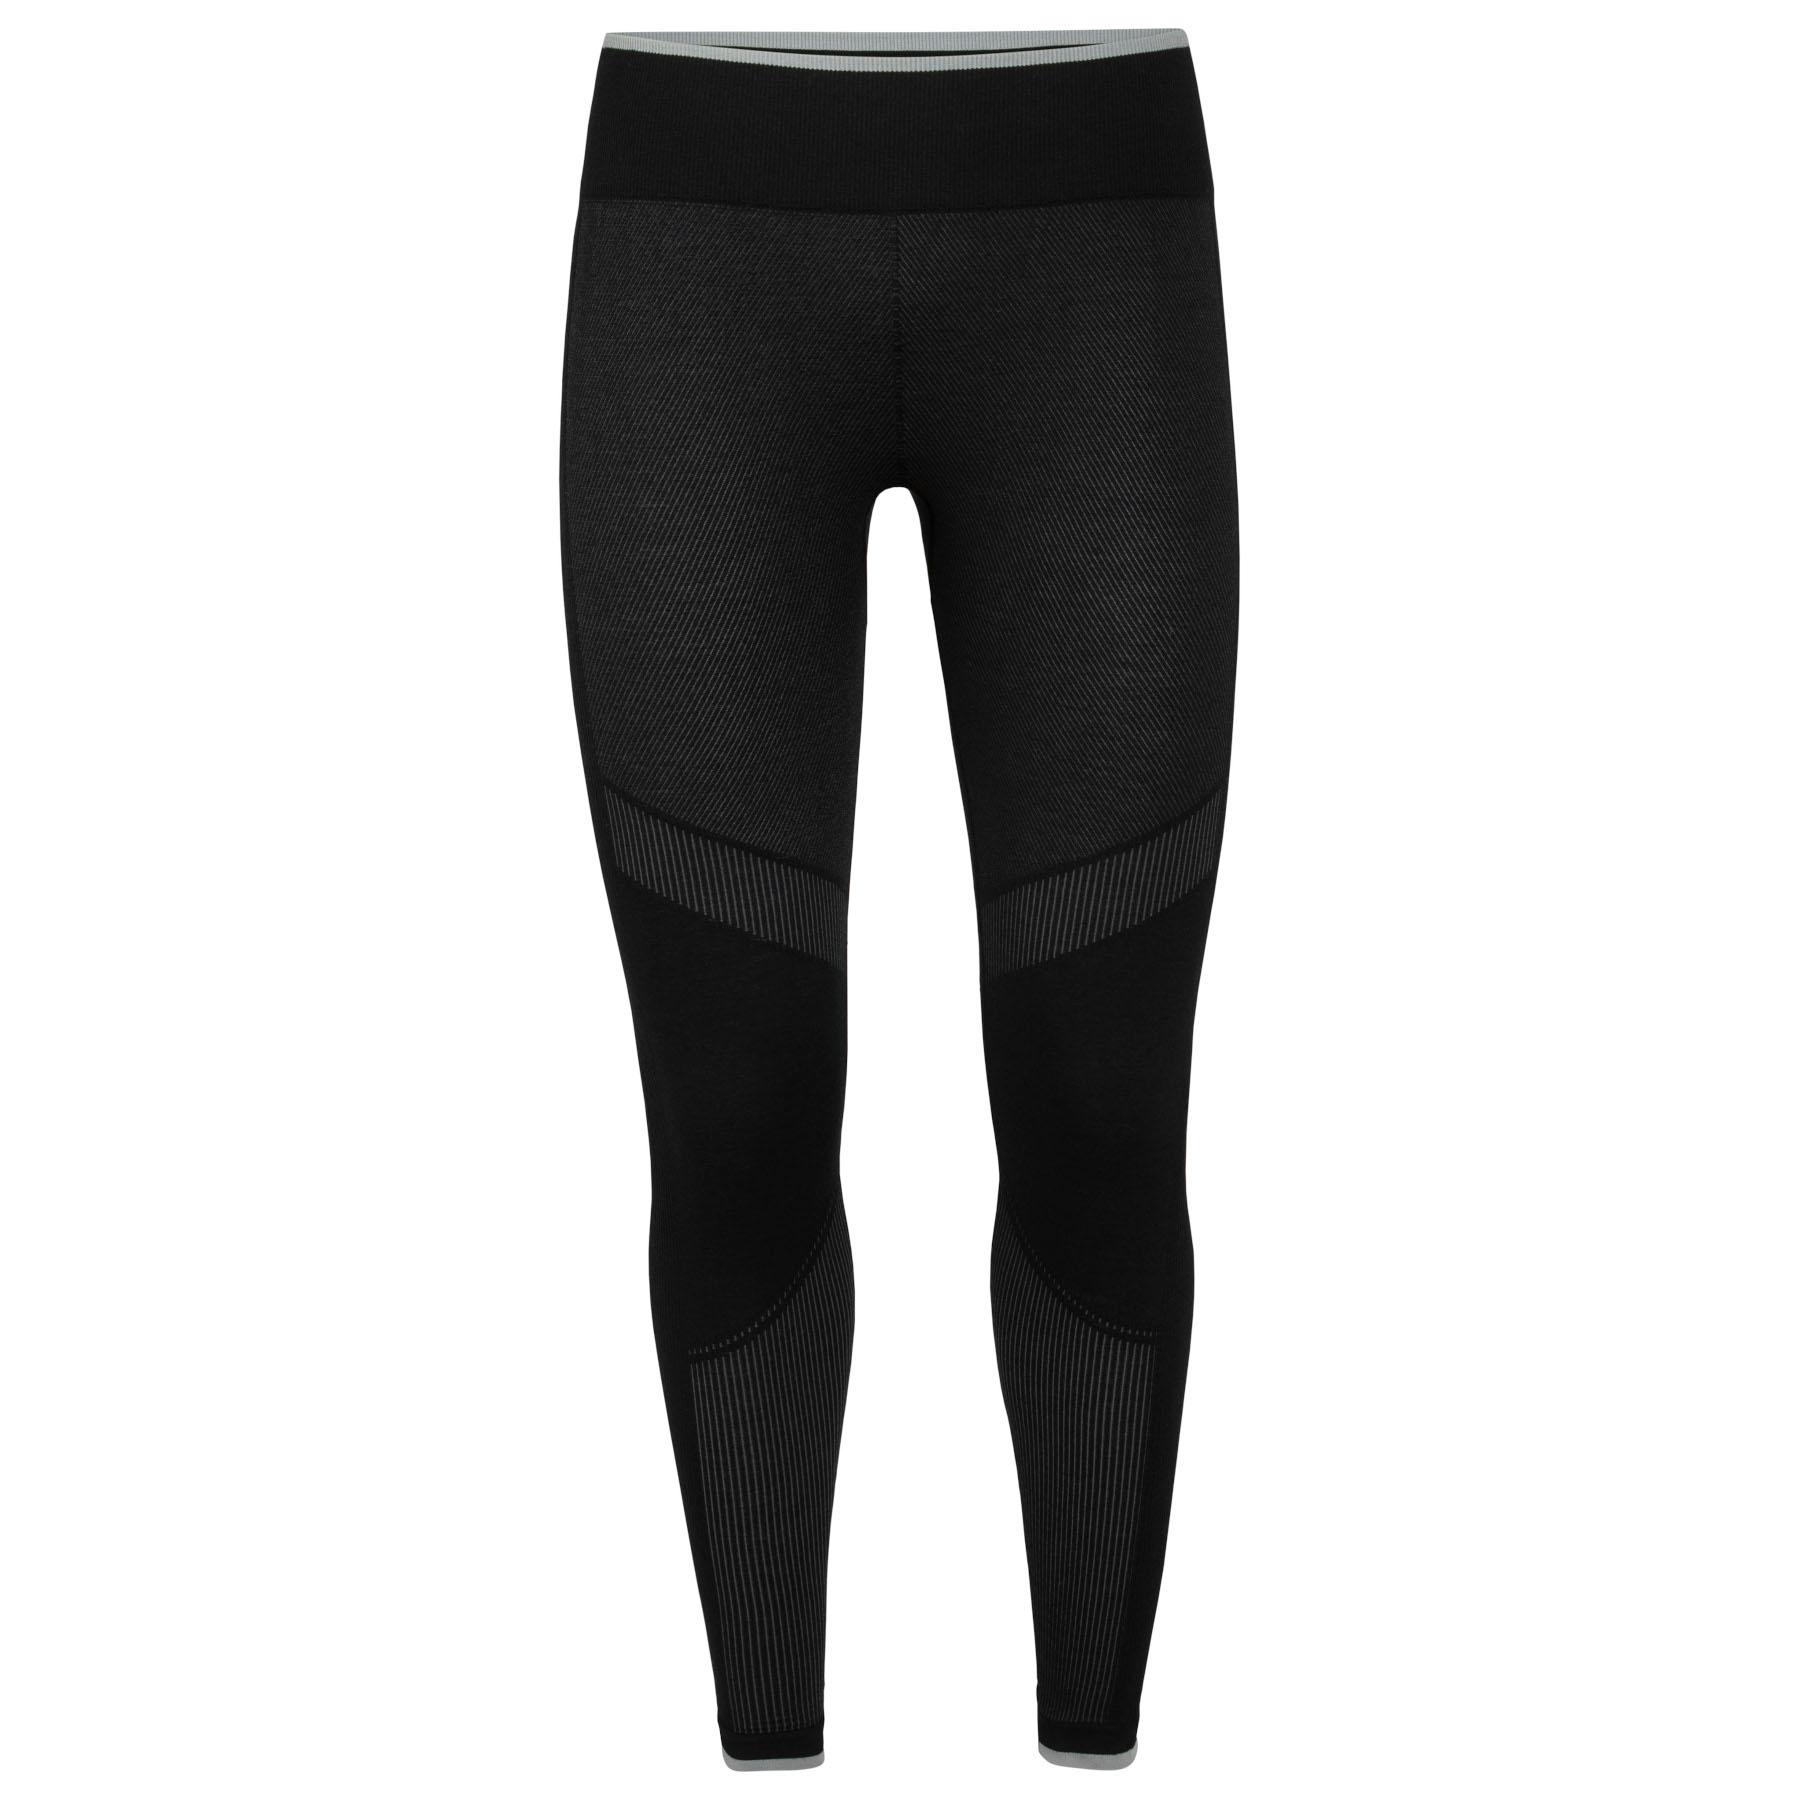 Produktbild von Icebreaker 200 Zone Seamless Damen Leggings - Black